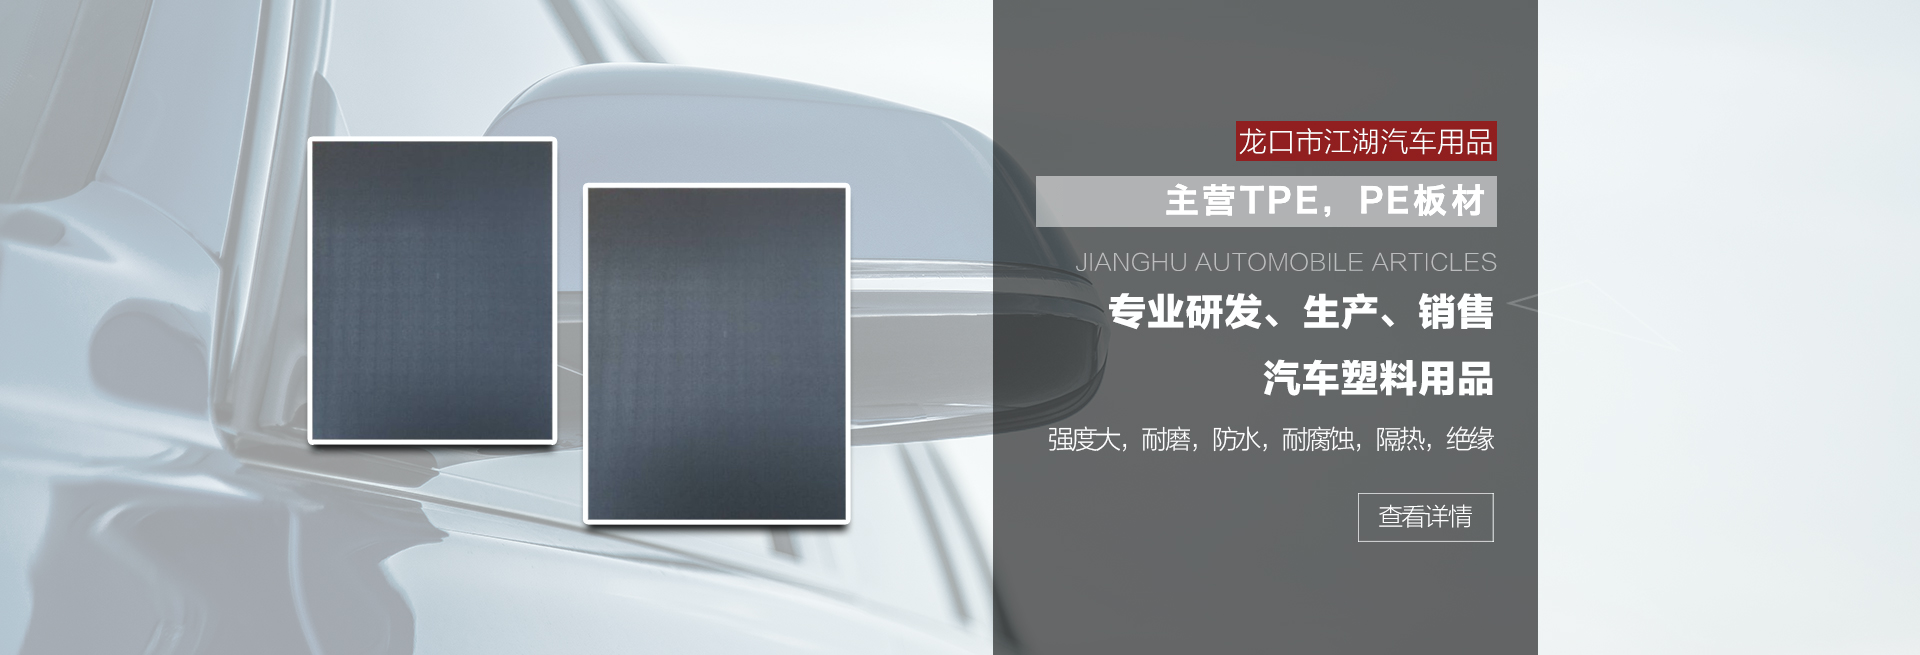 tpe板,tpe板,tpe板,tpe板,龙口市江湖汽车有限公司